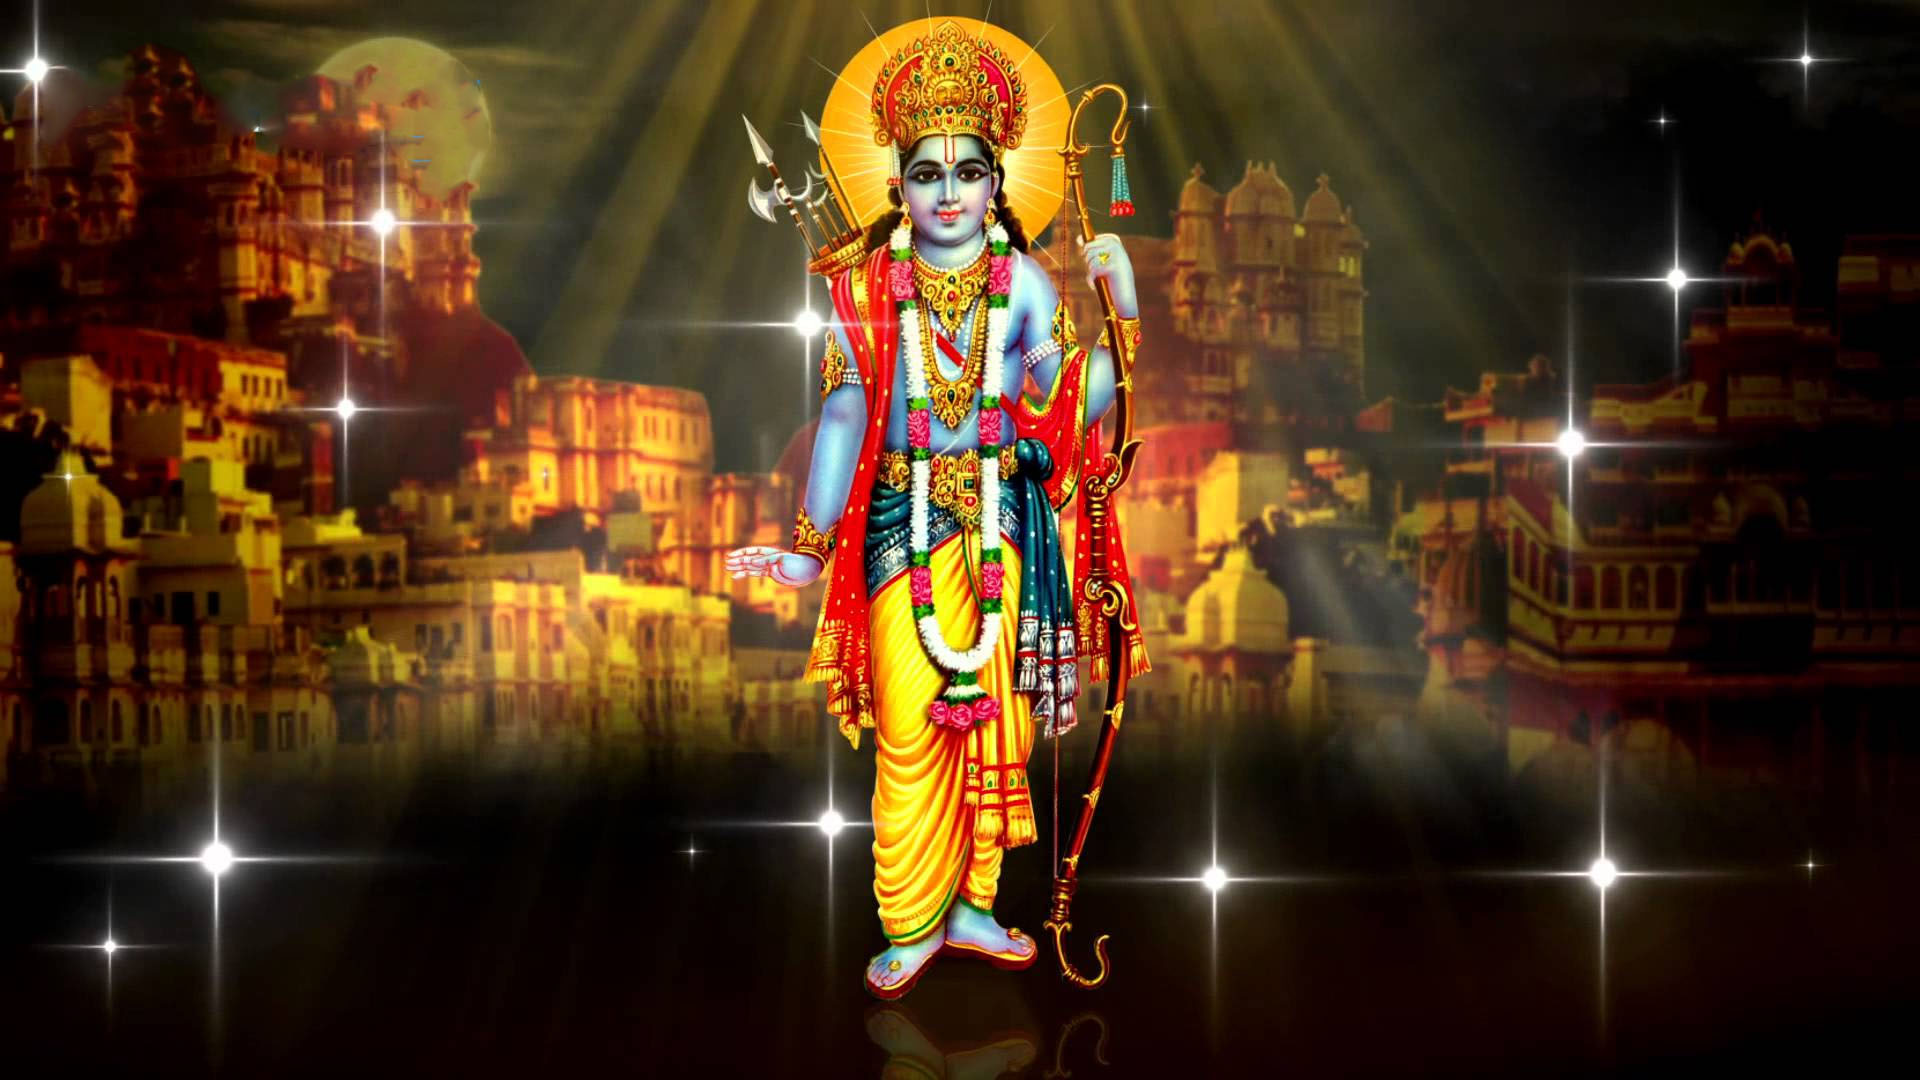 Shri Ram Hd Wallpaper Free Download